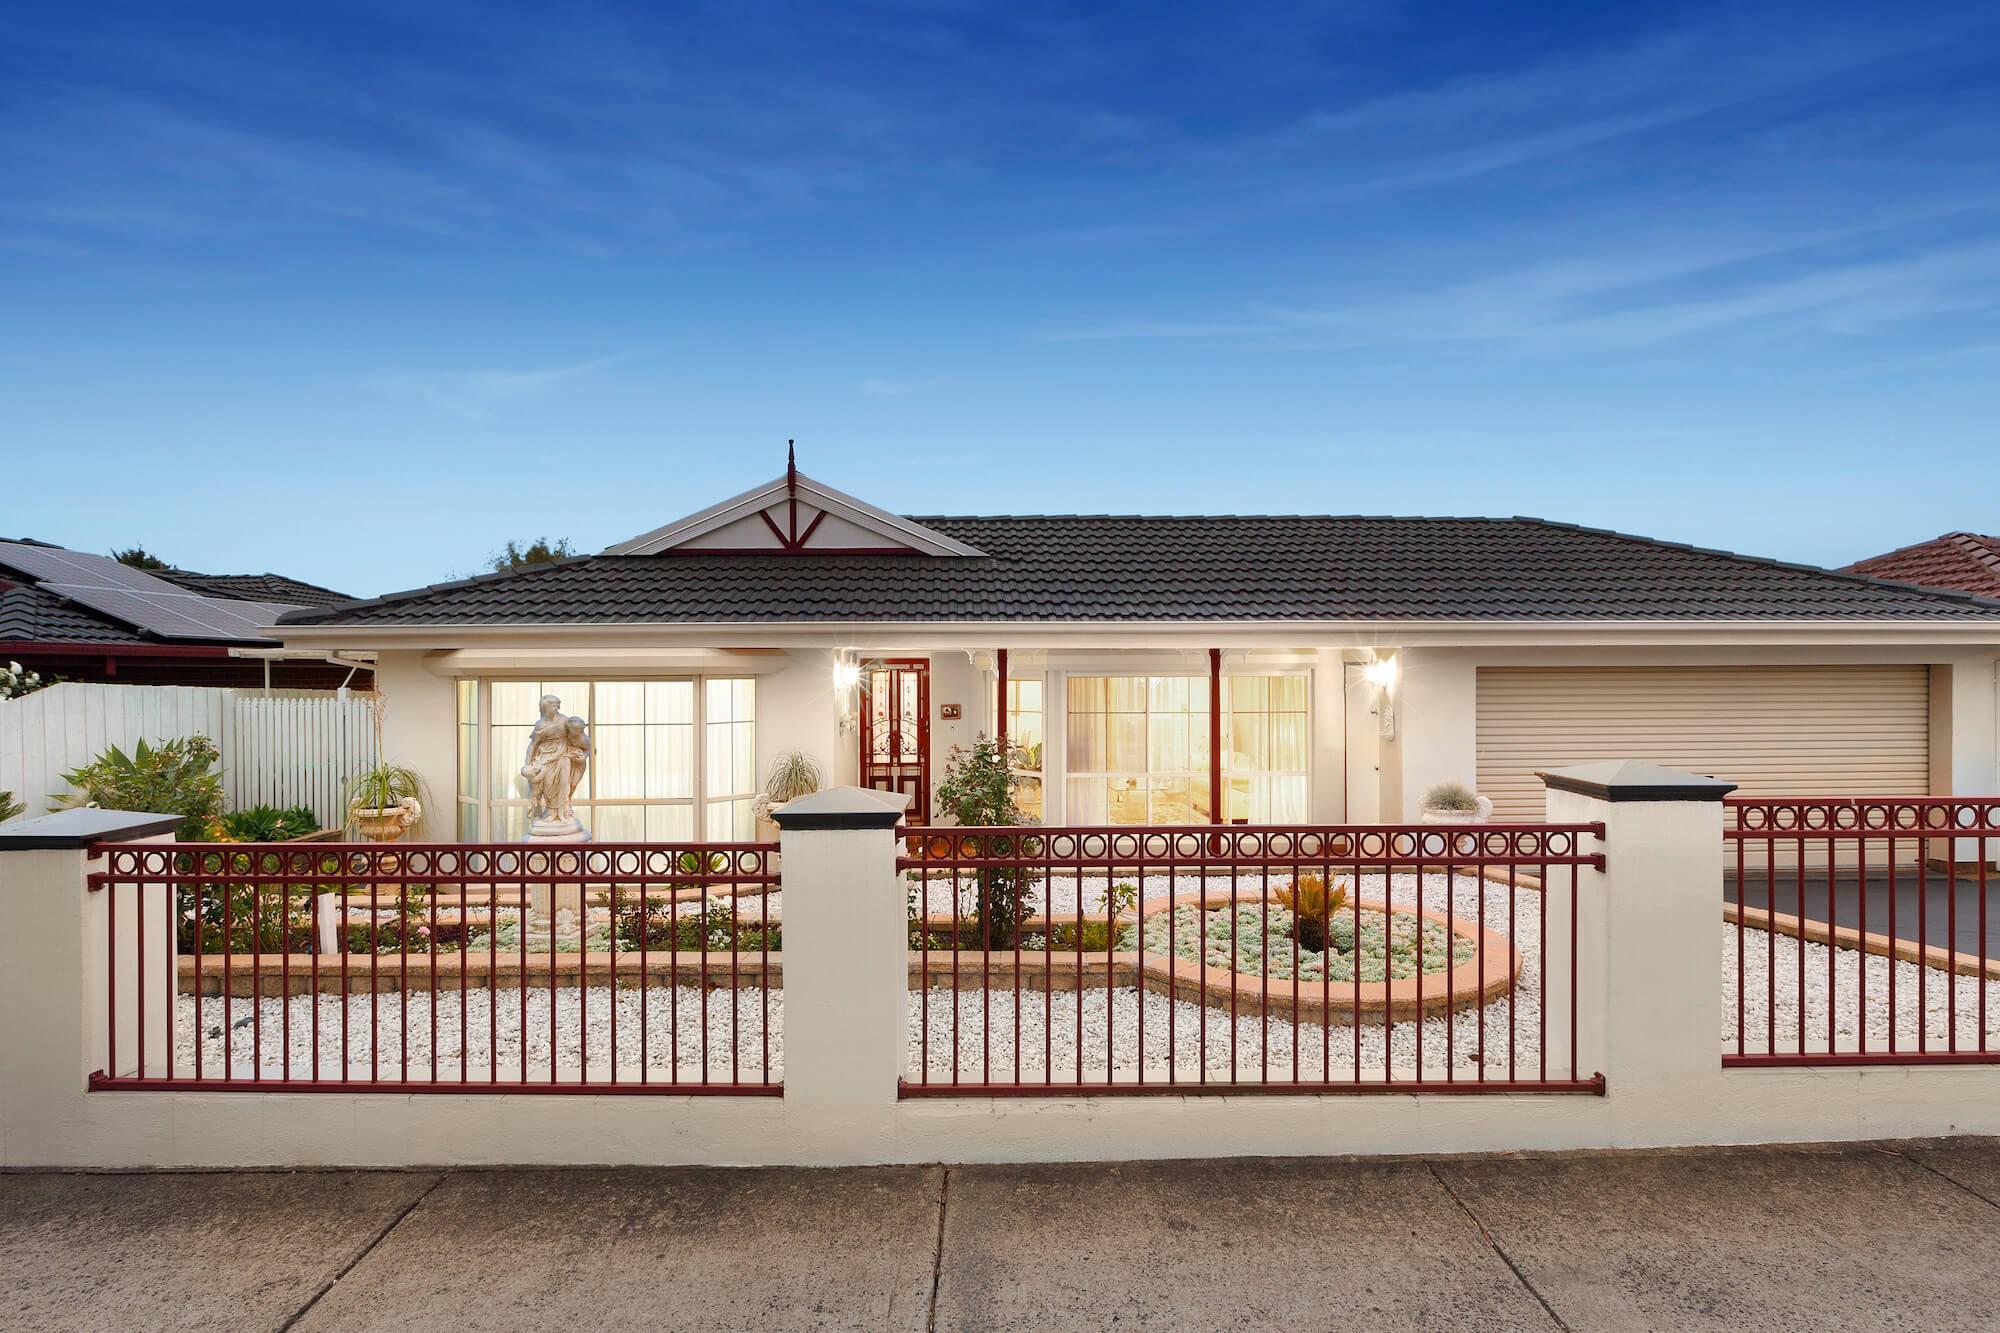 Property for sale 133 Fleetwood Drive Narre Warren VIC 3805